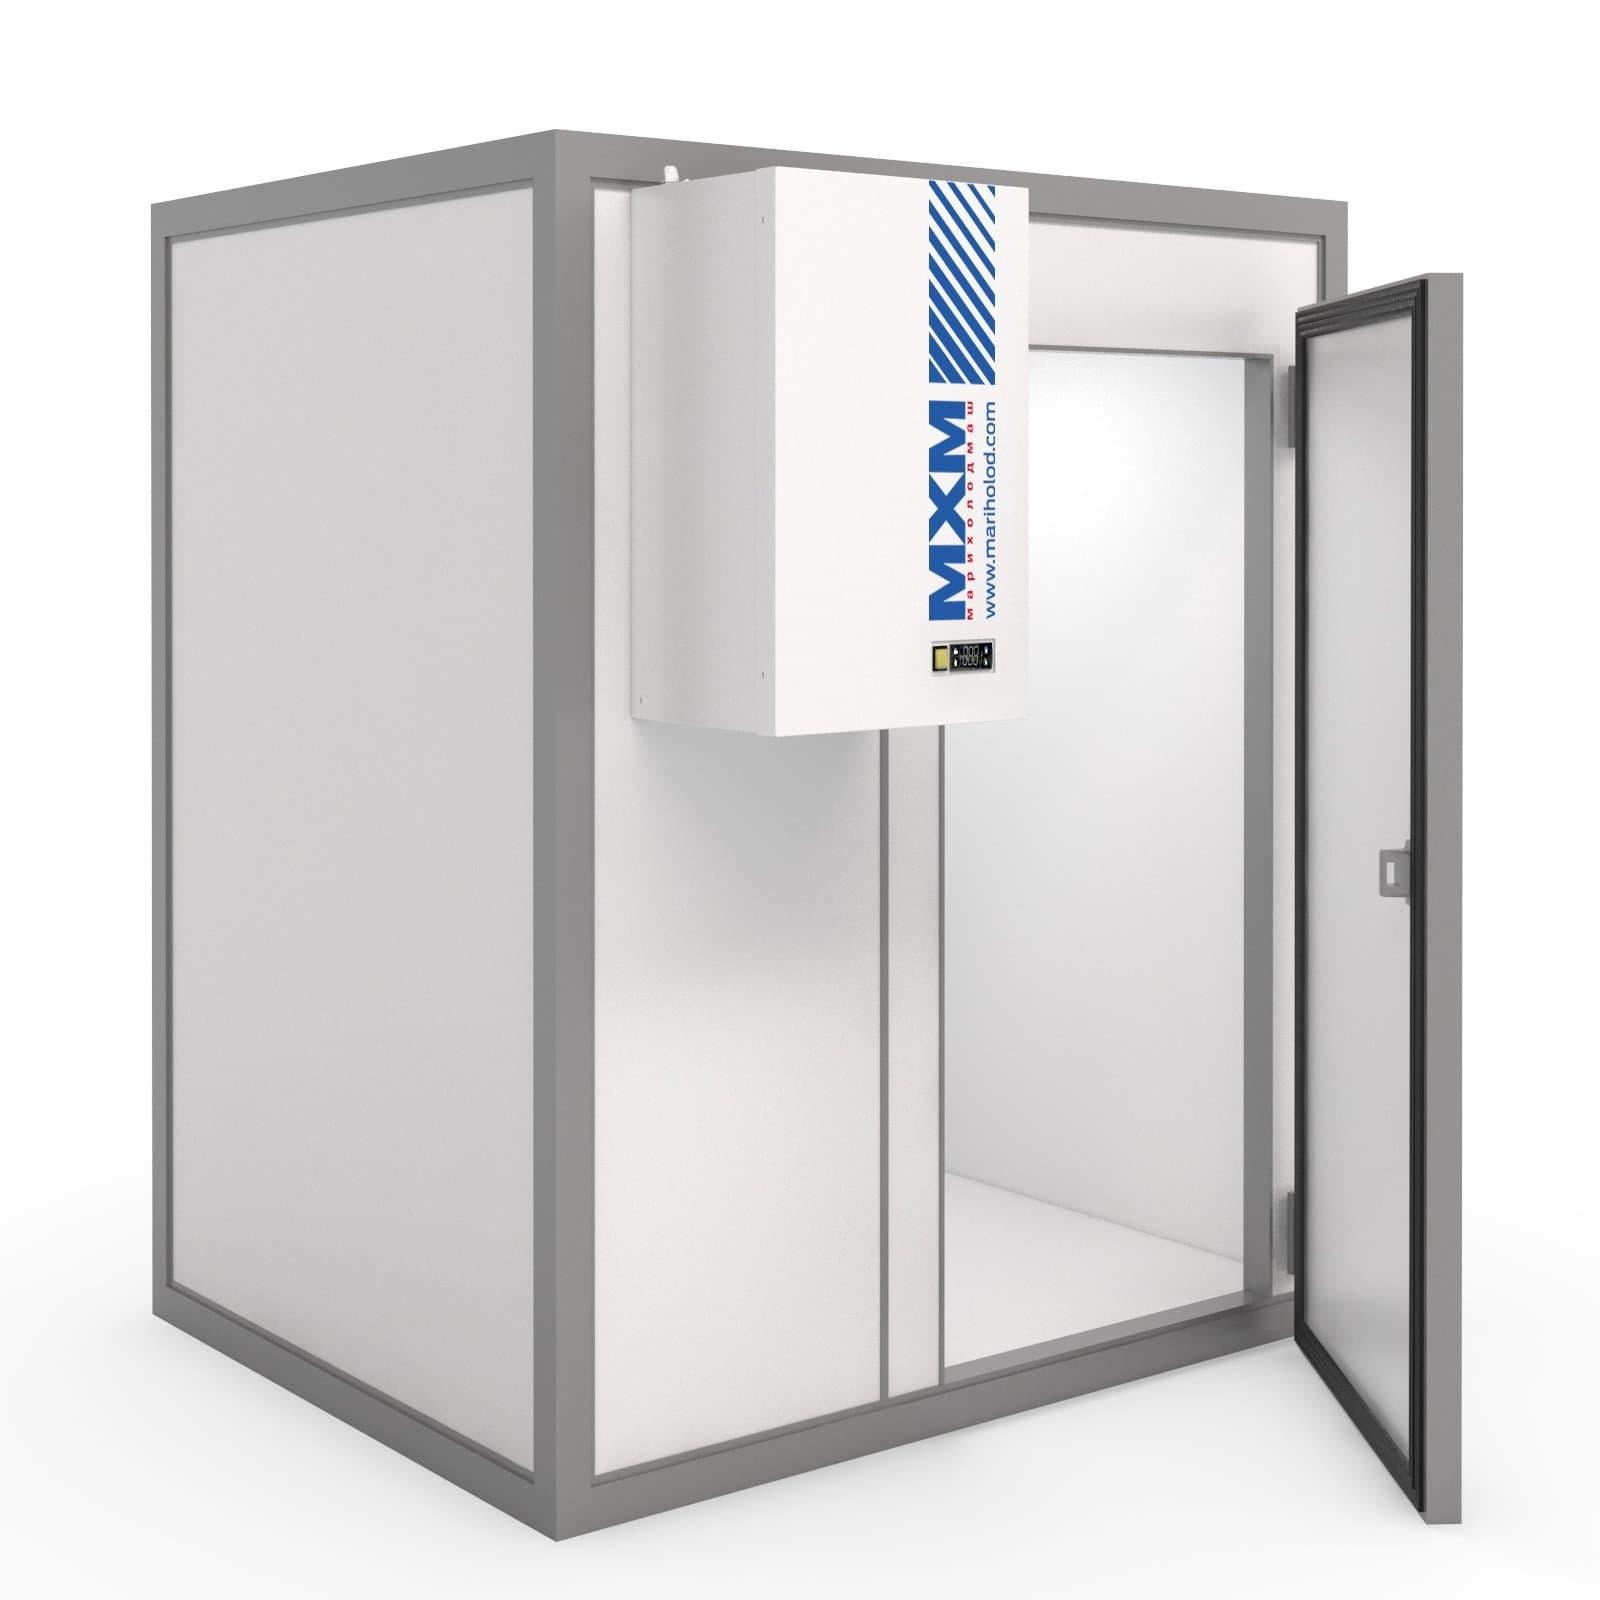 Камера холодильная МХМ КХН-25,80 1360×8560×2720